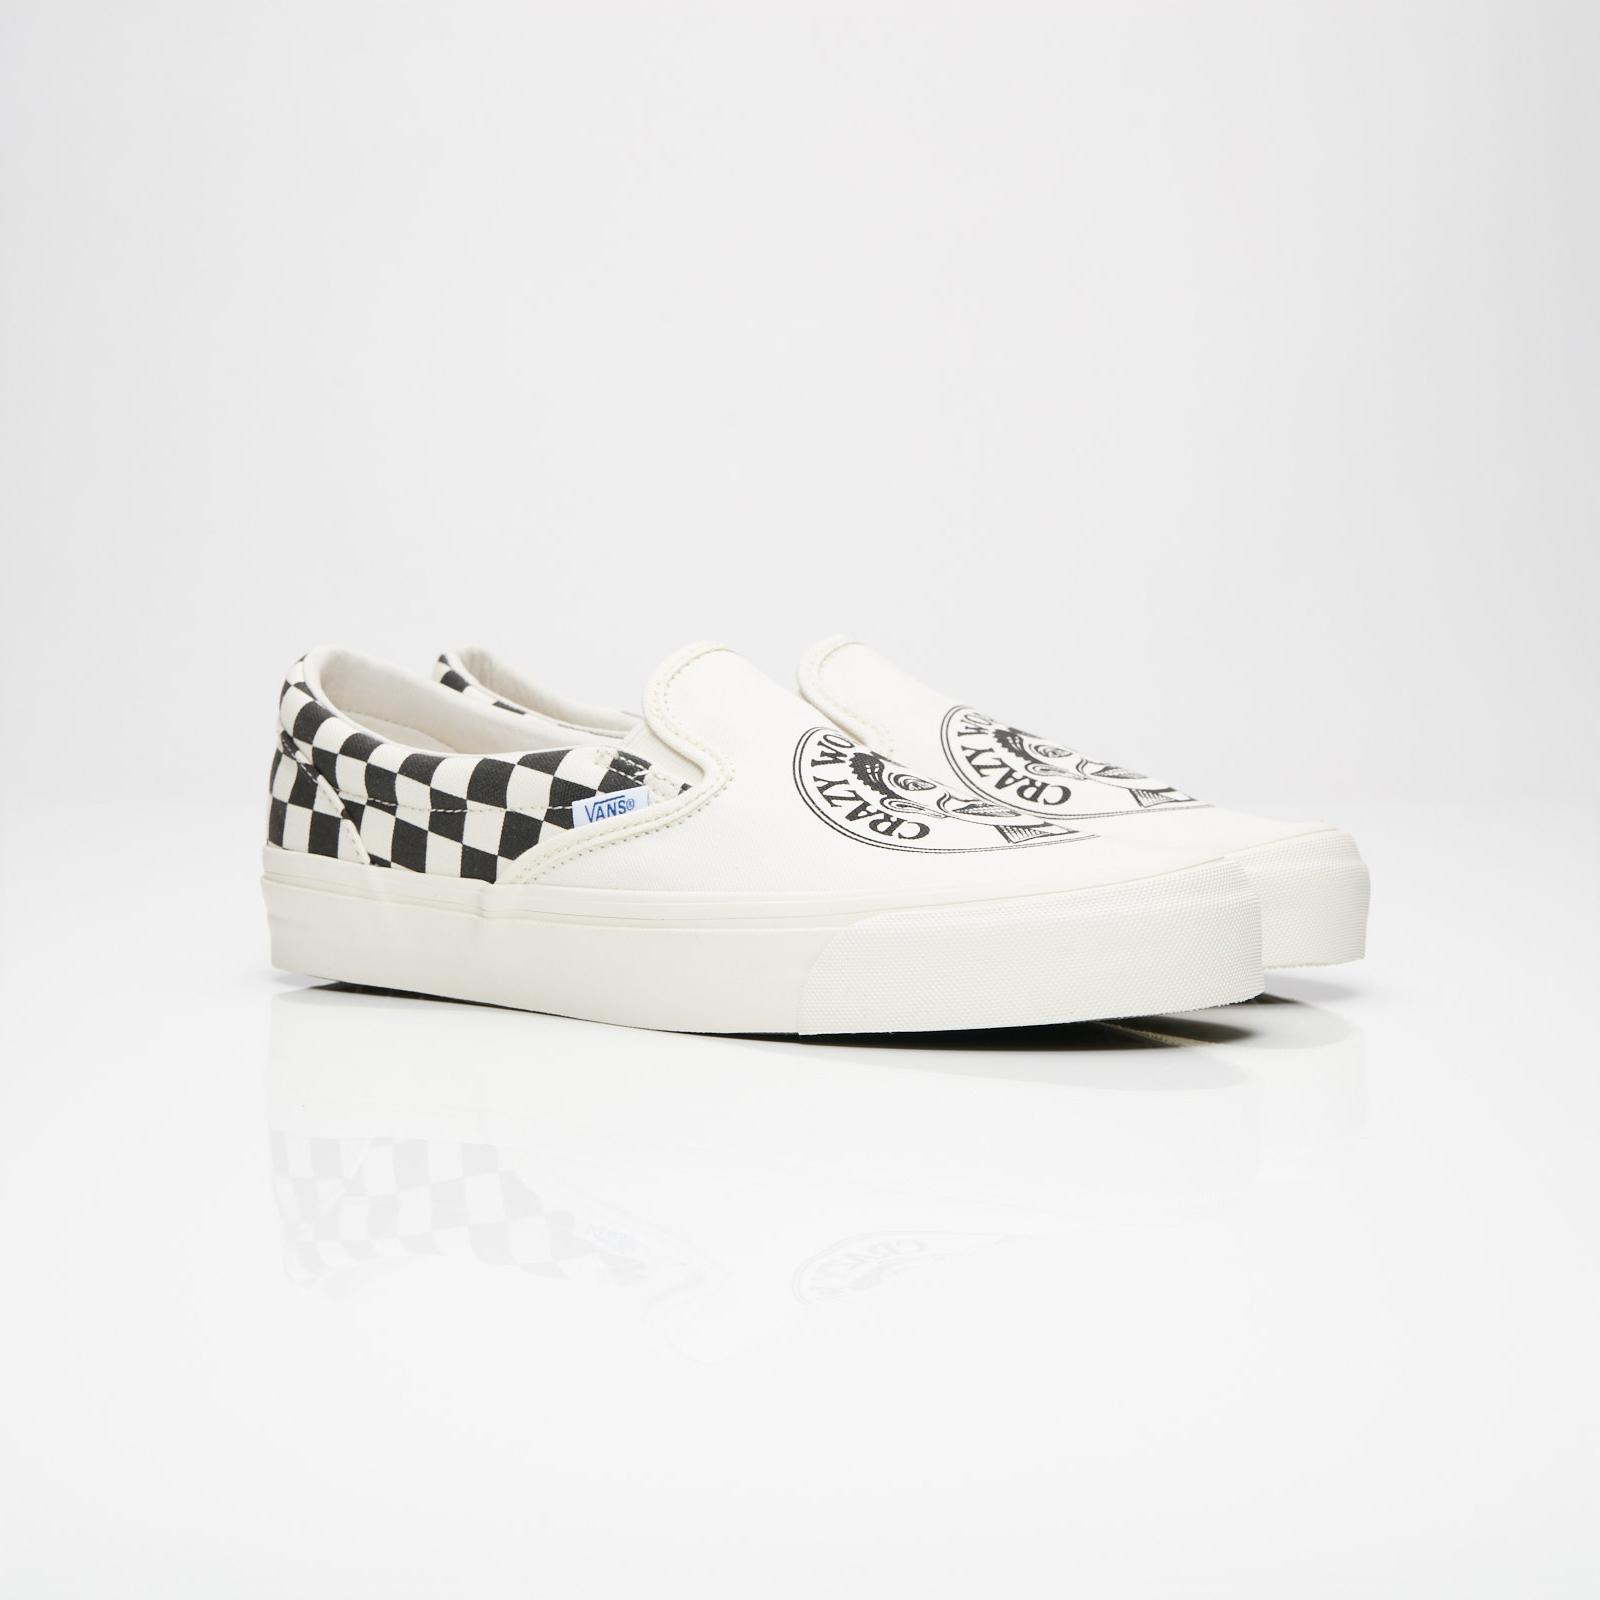 98e4f65ab063 Vans UA OG Classic Slip-On LX - V00udfqlu - Sneakersnstuff ...